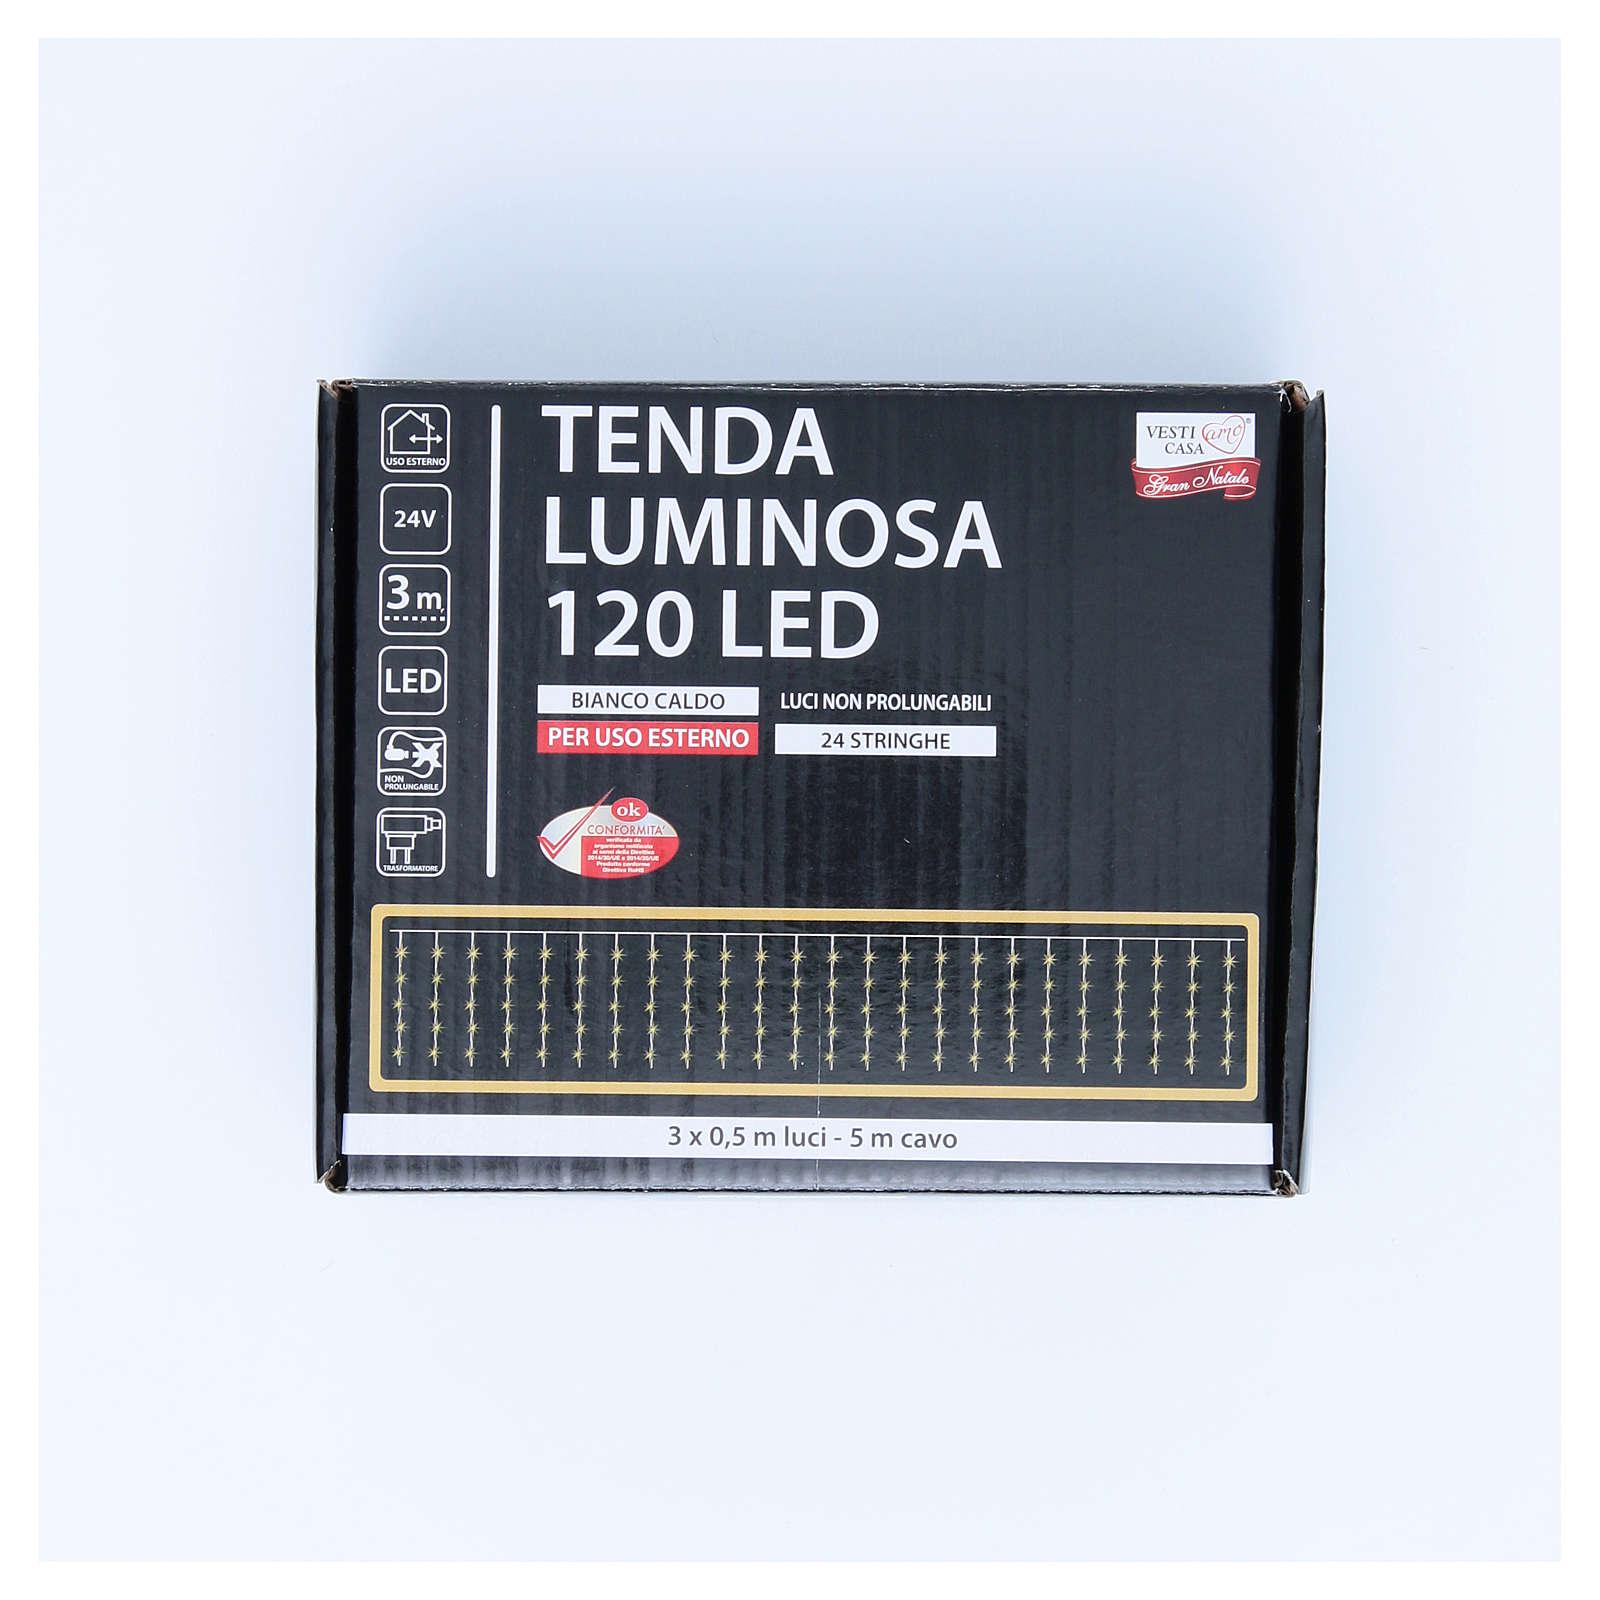 Cortina luminosa 120 LED blanco cálido para exterior, funcionamiento corriente 3